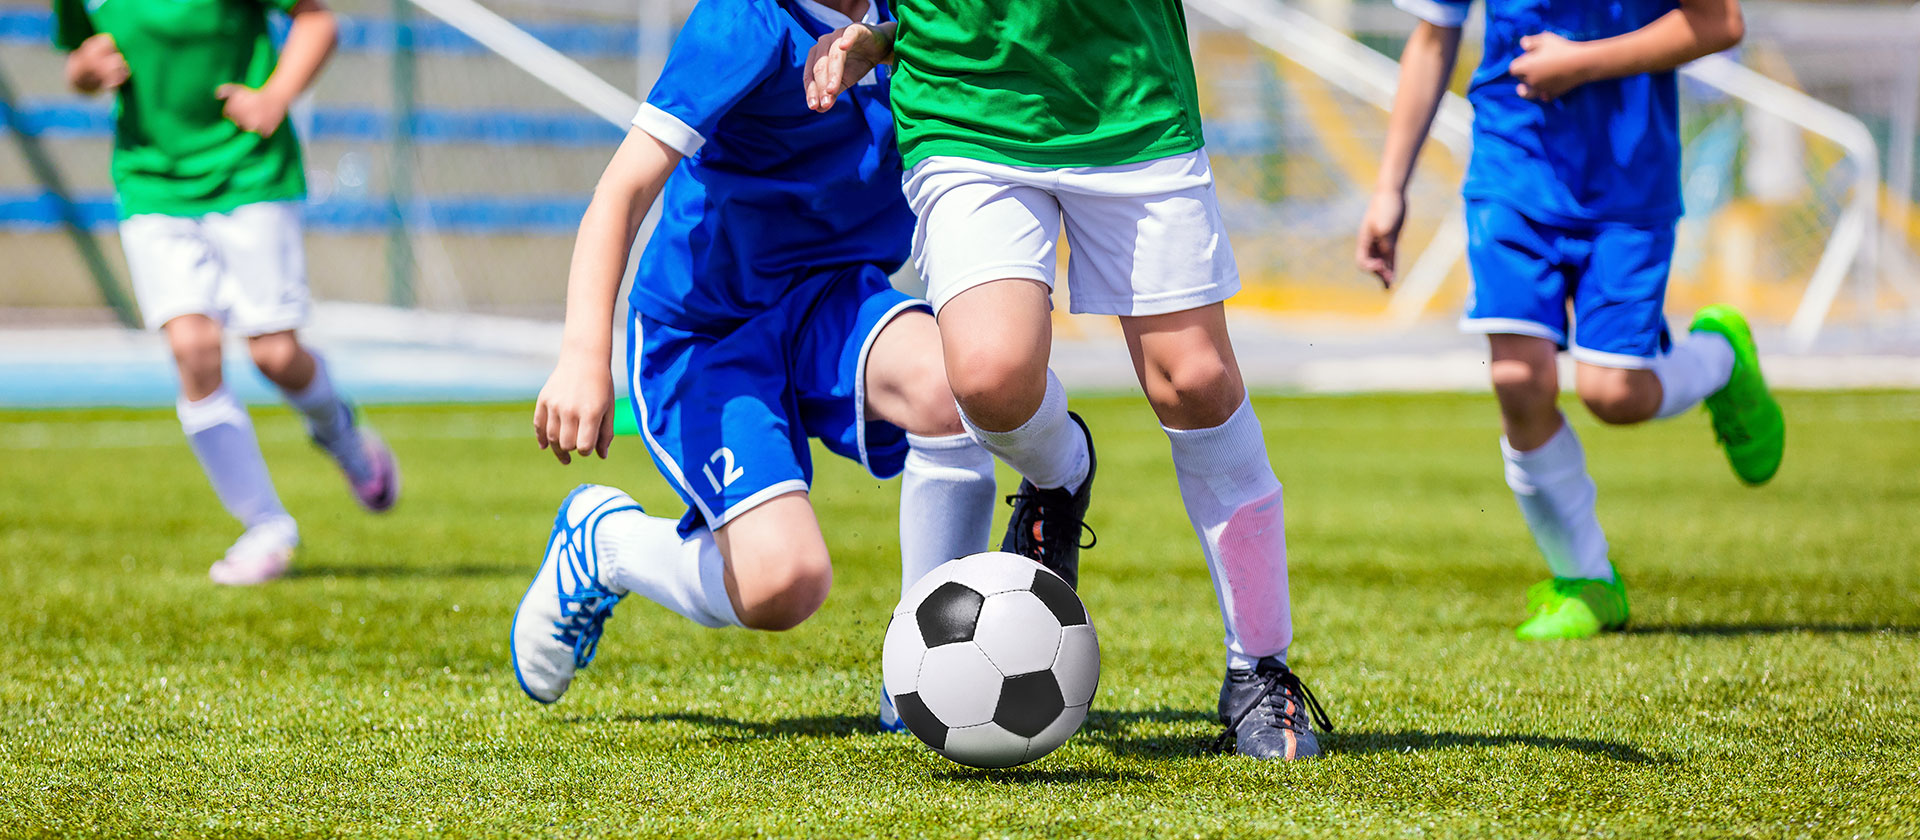 Jugendfußball Online Training